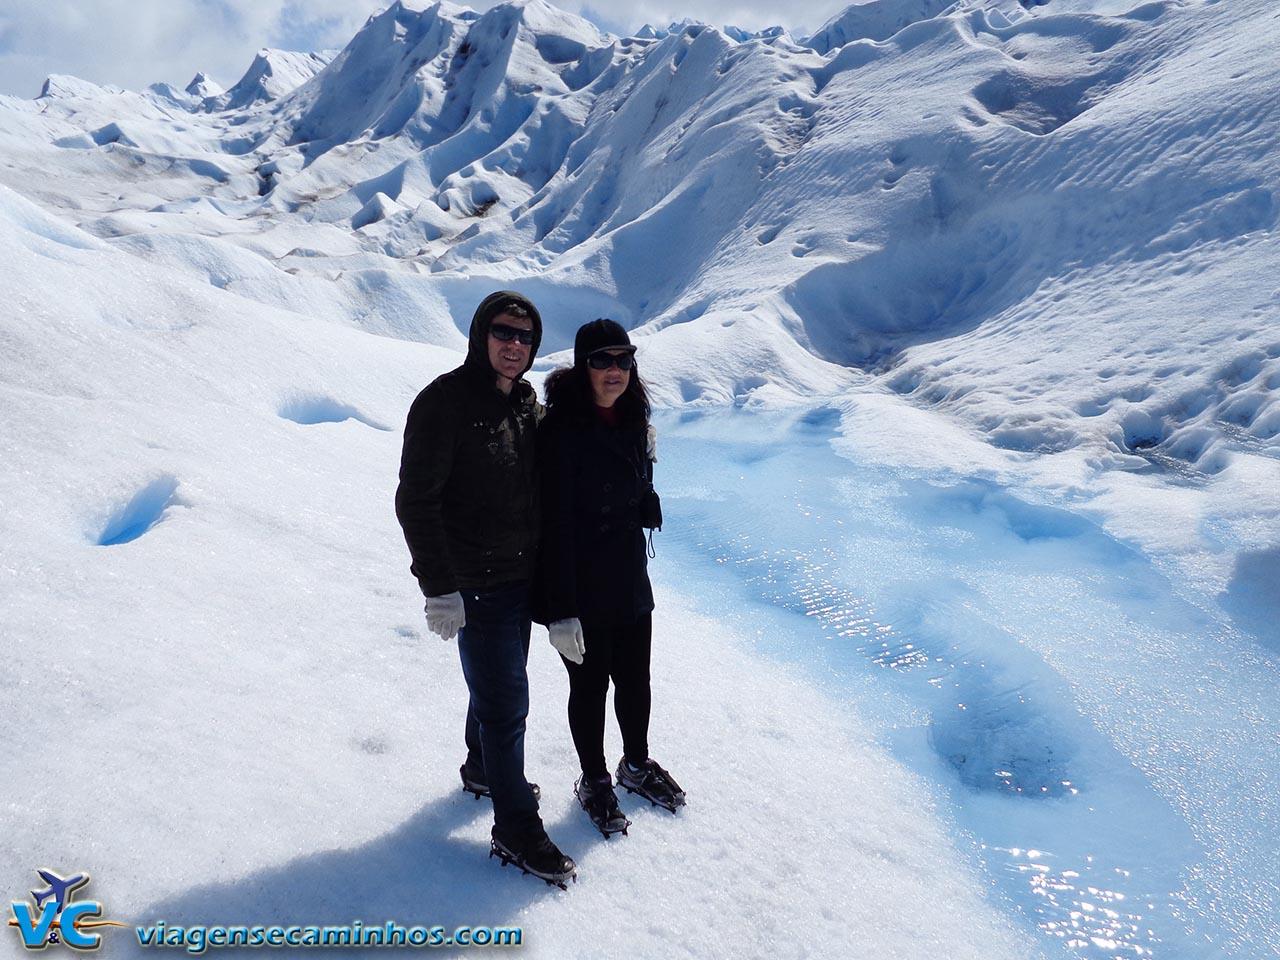 Minitrekking no Glaciar Perito Moreno